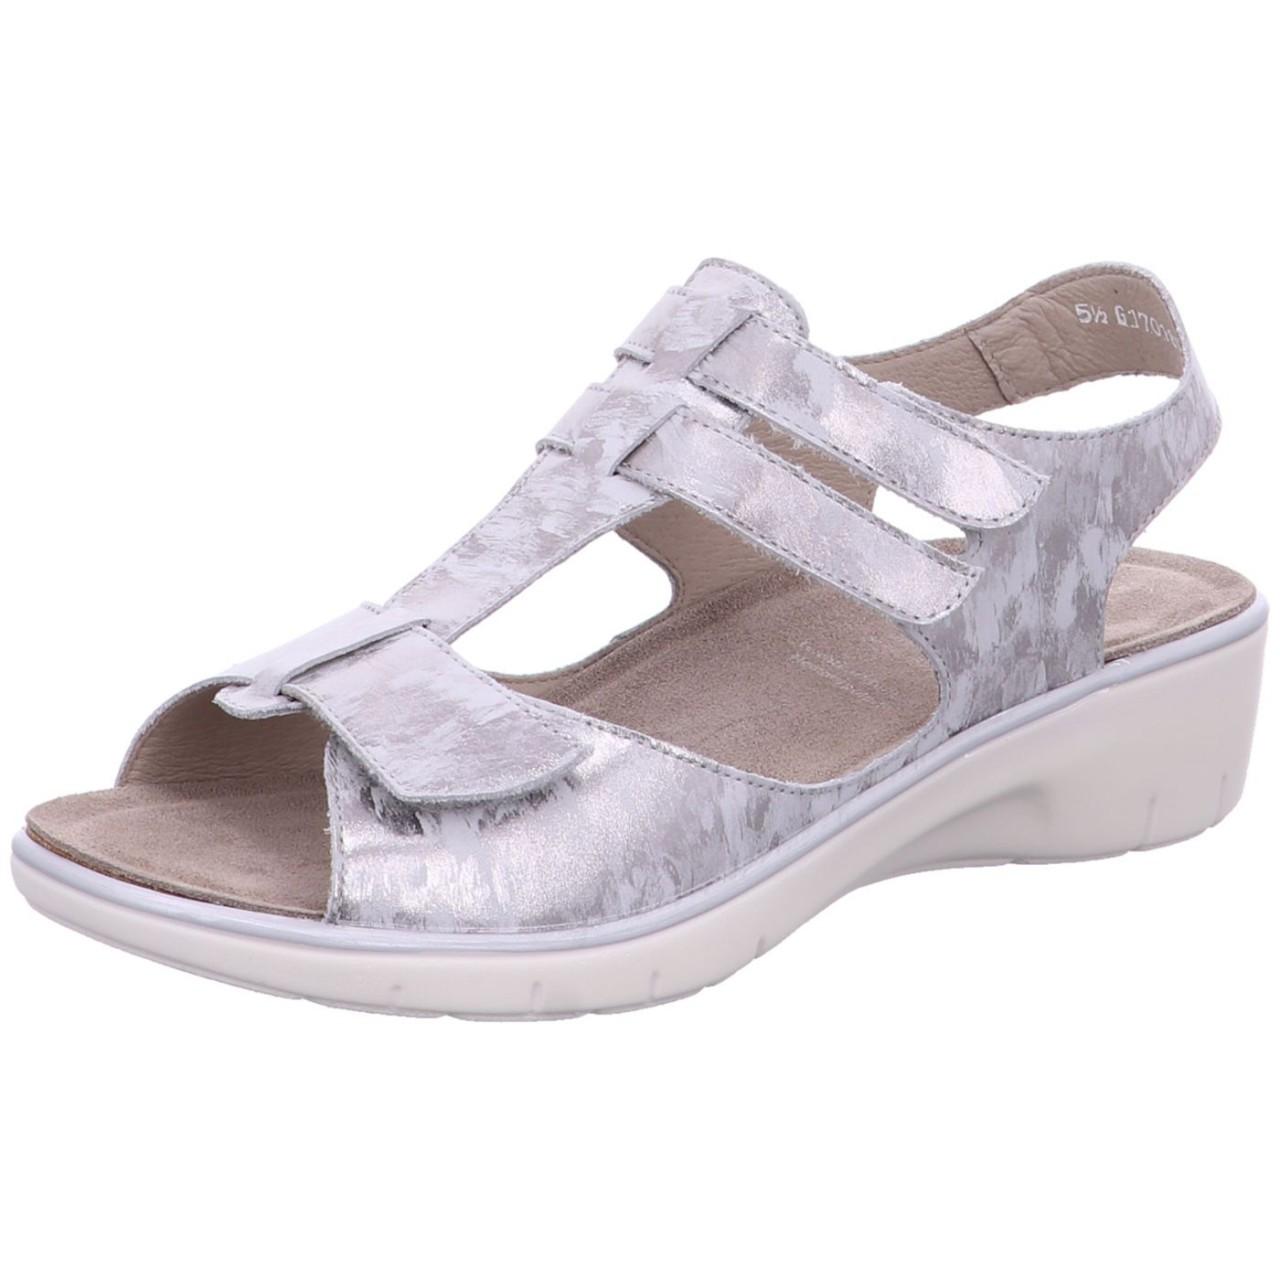 Solidus Sandale Gina G Grau grey 24002 20449